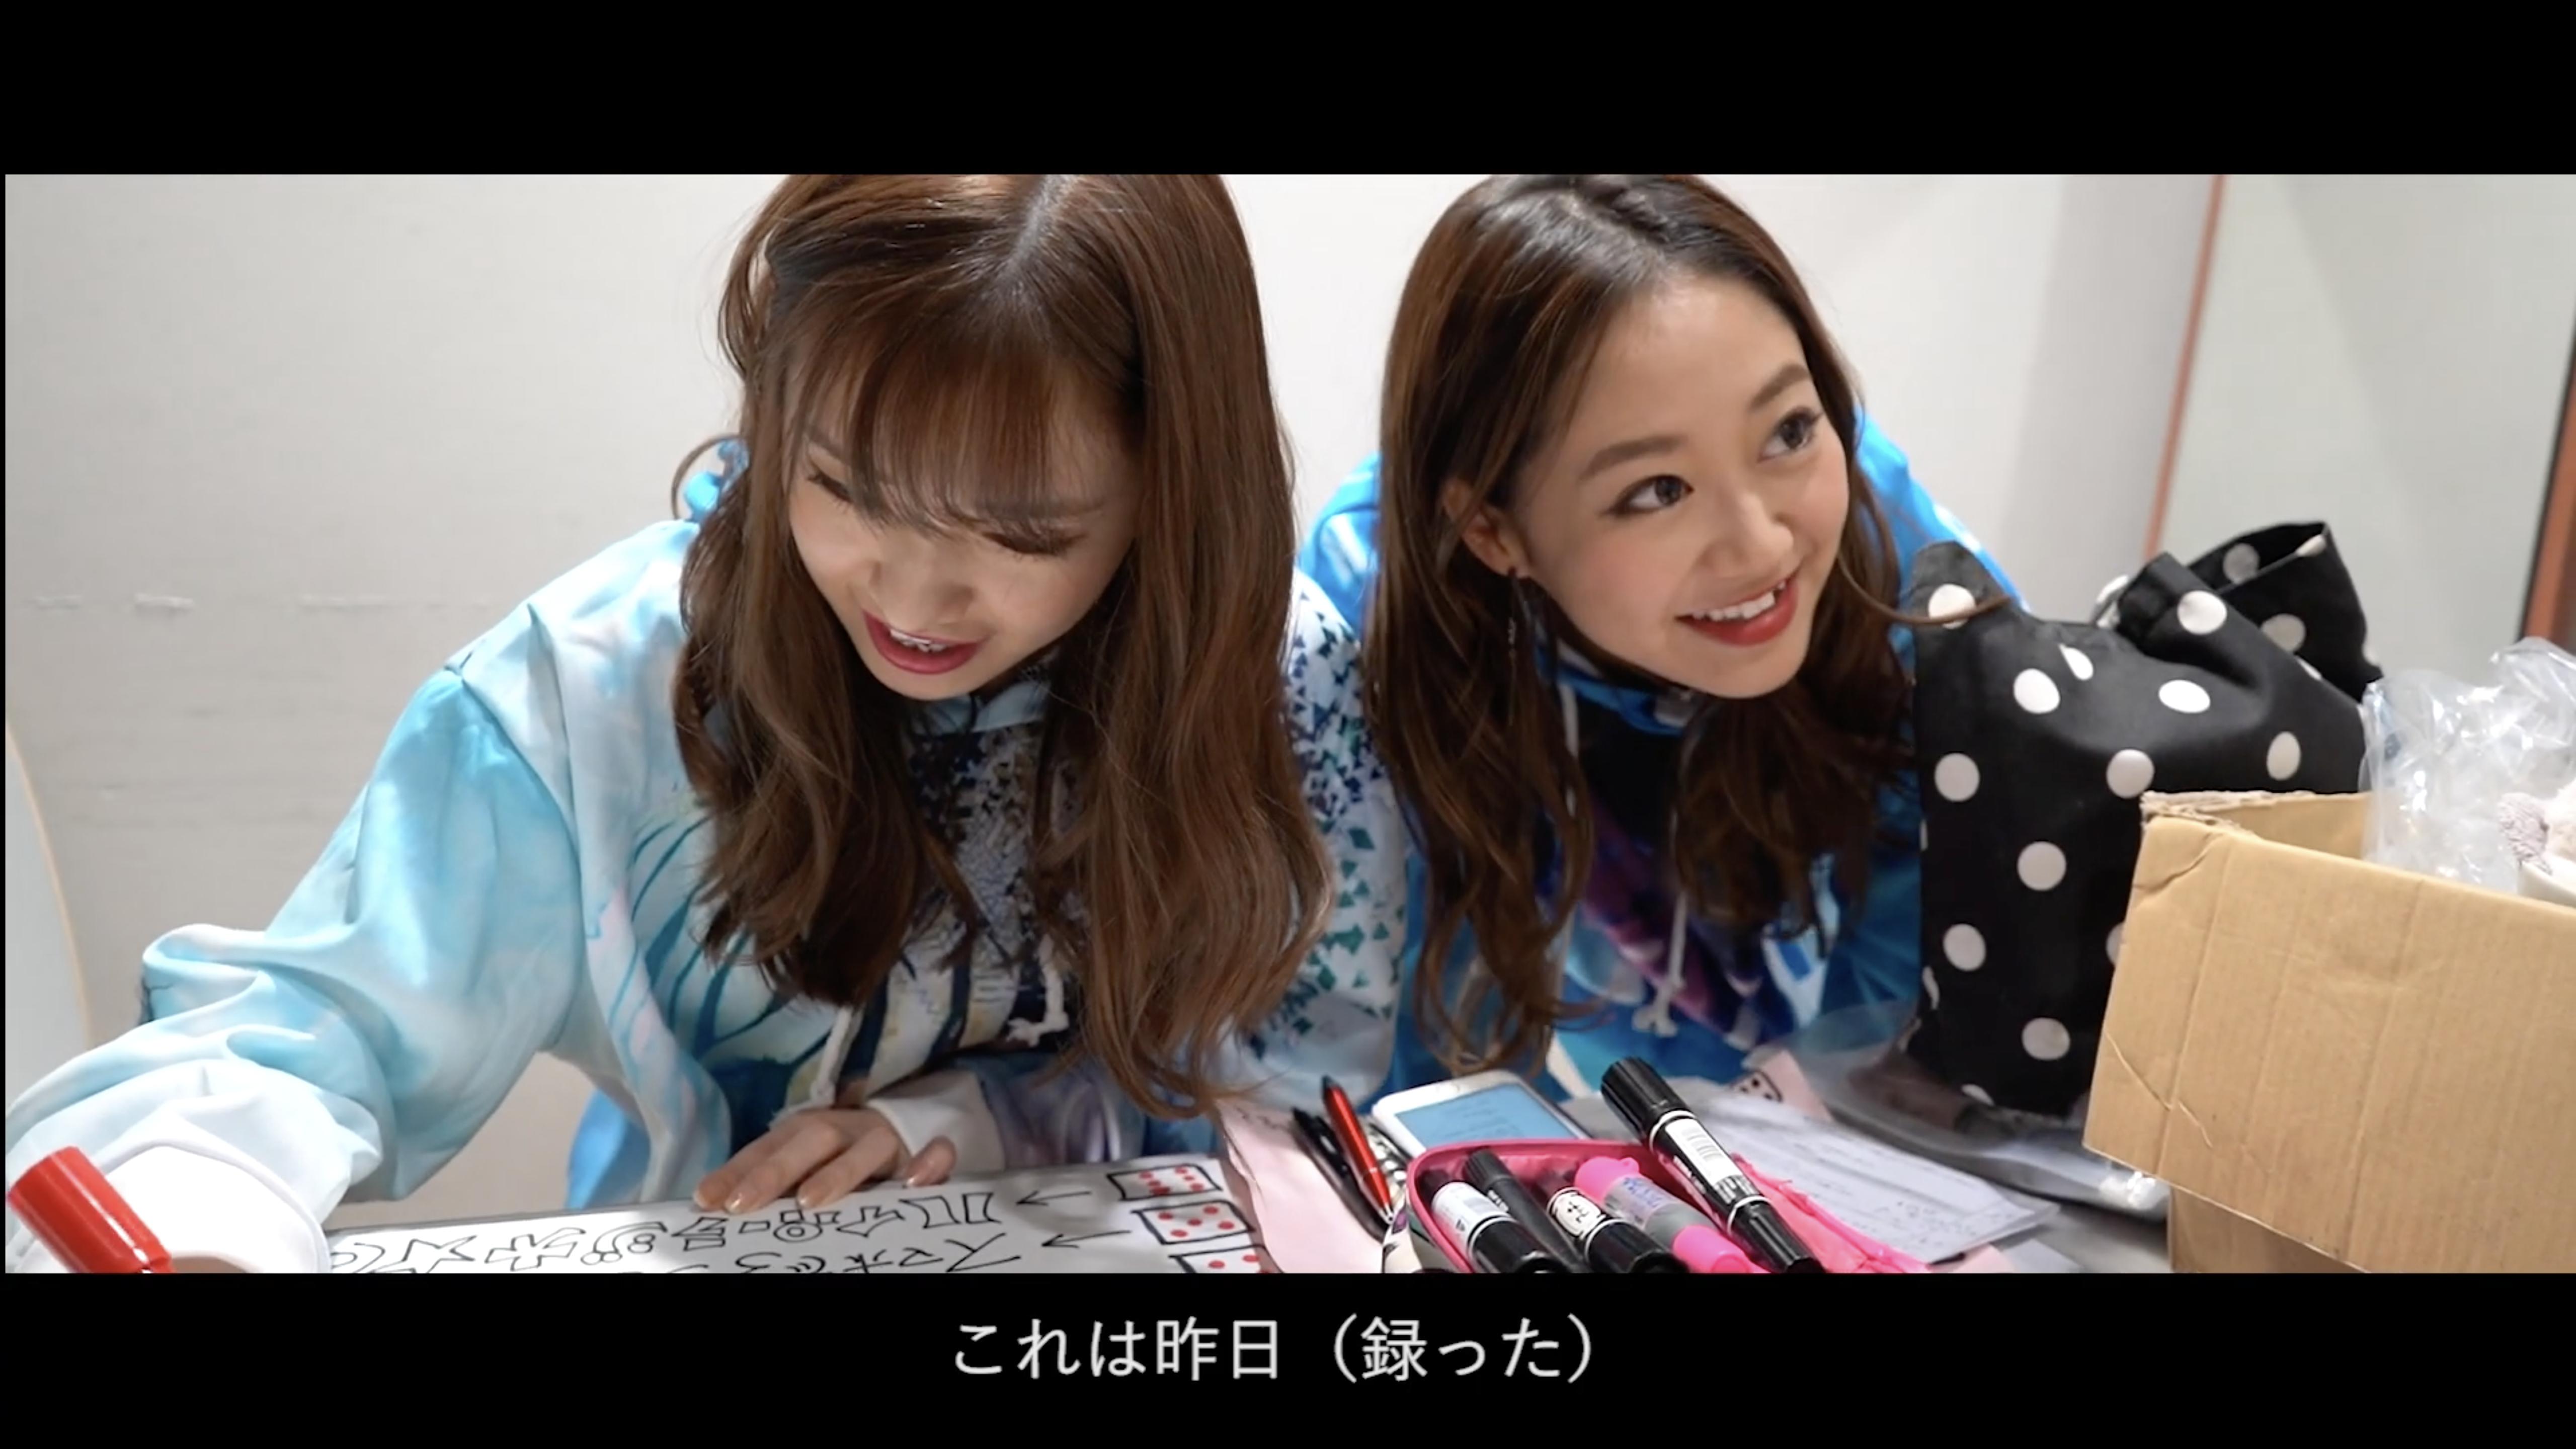 hy4_4yh(ハイパーヨーヨ)ドキュメンタリー第5話 画像04